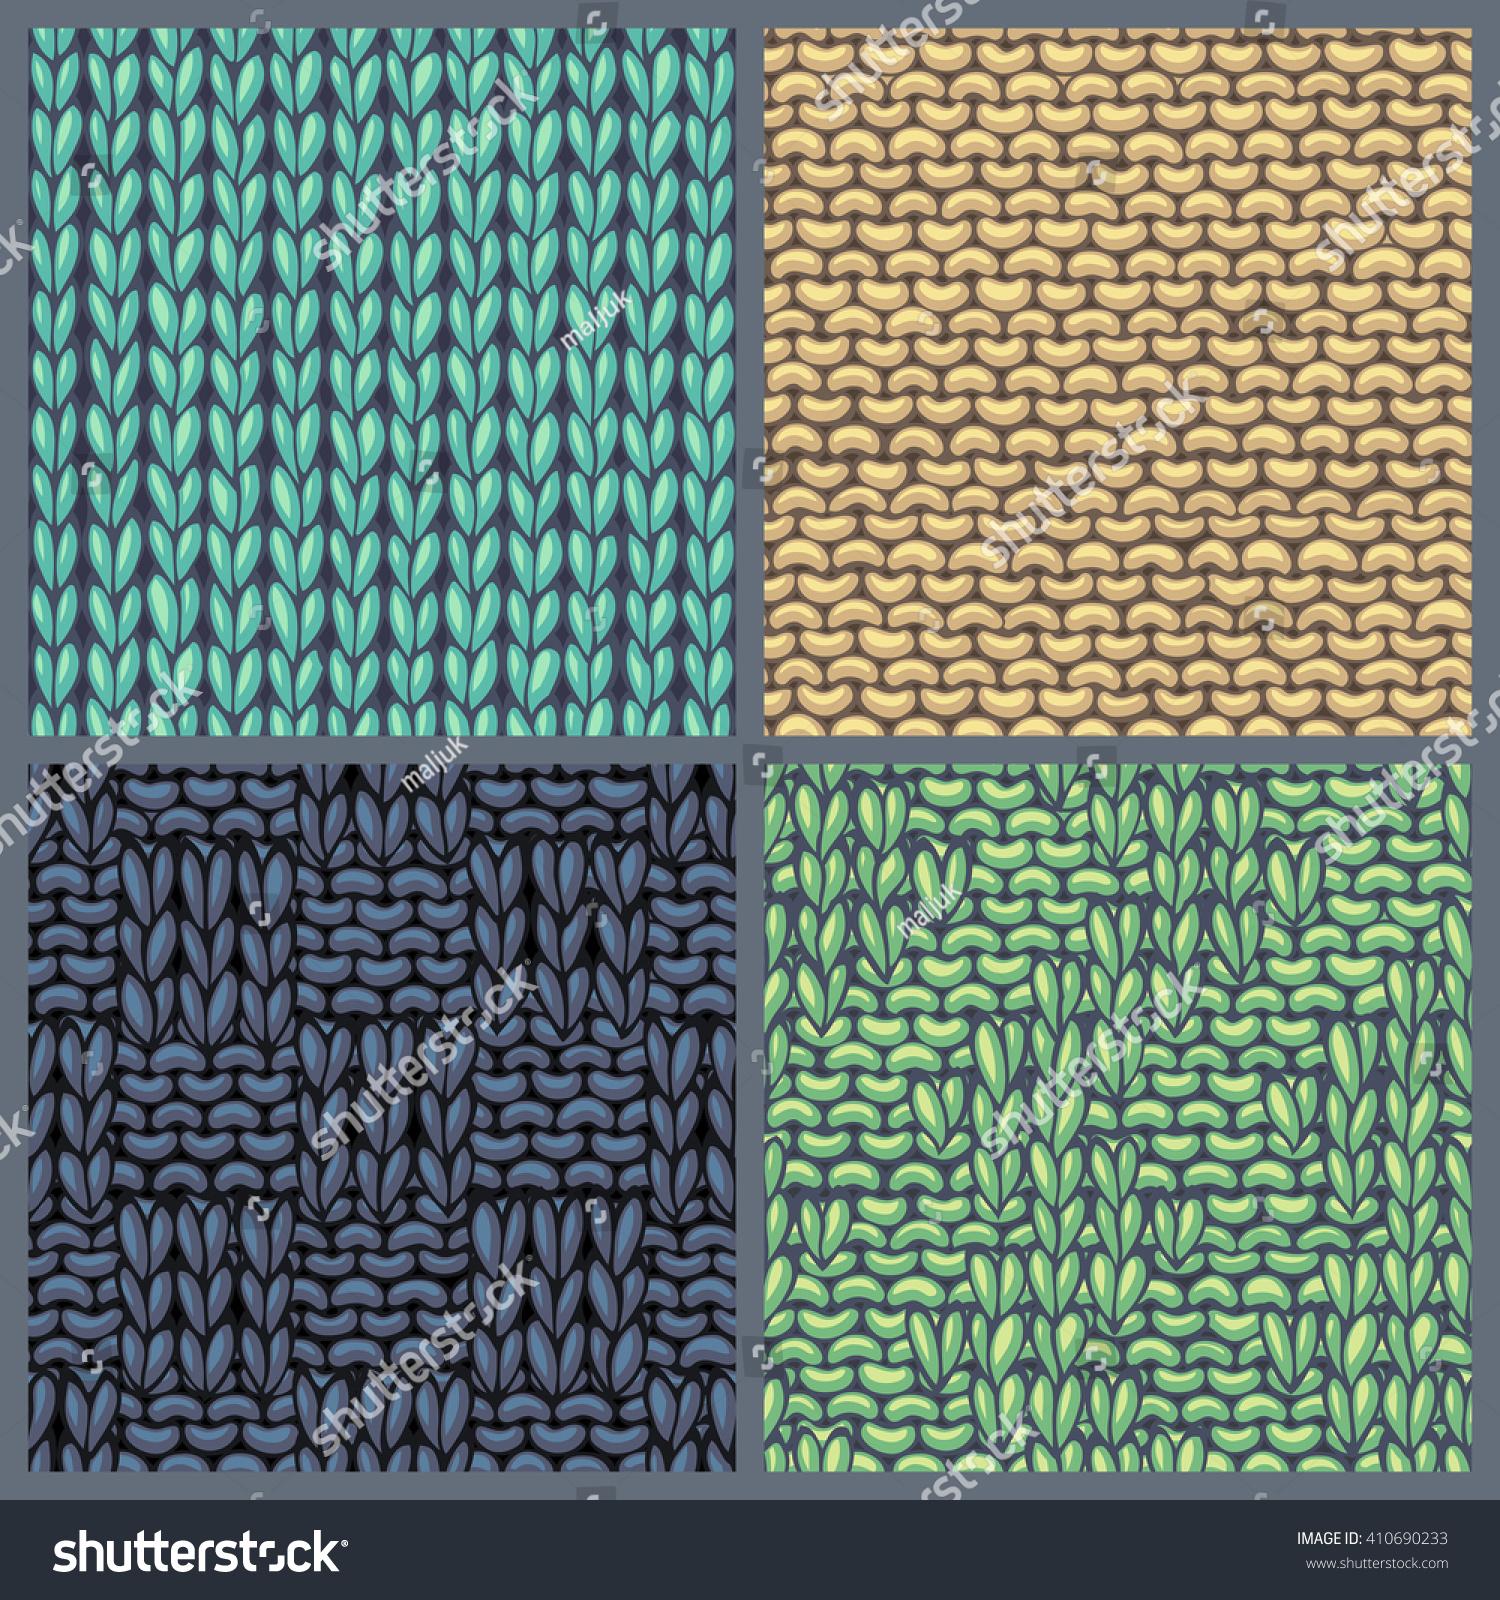 Vector Set Various Knitting Patterns Seamless Stock Vector (2018 ...